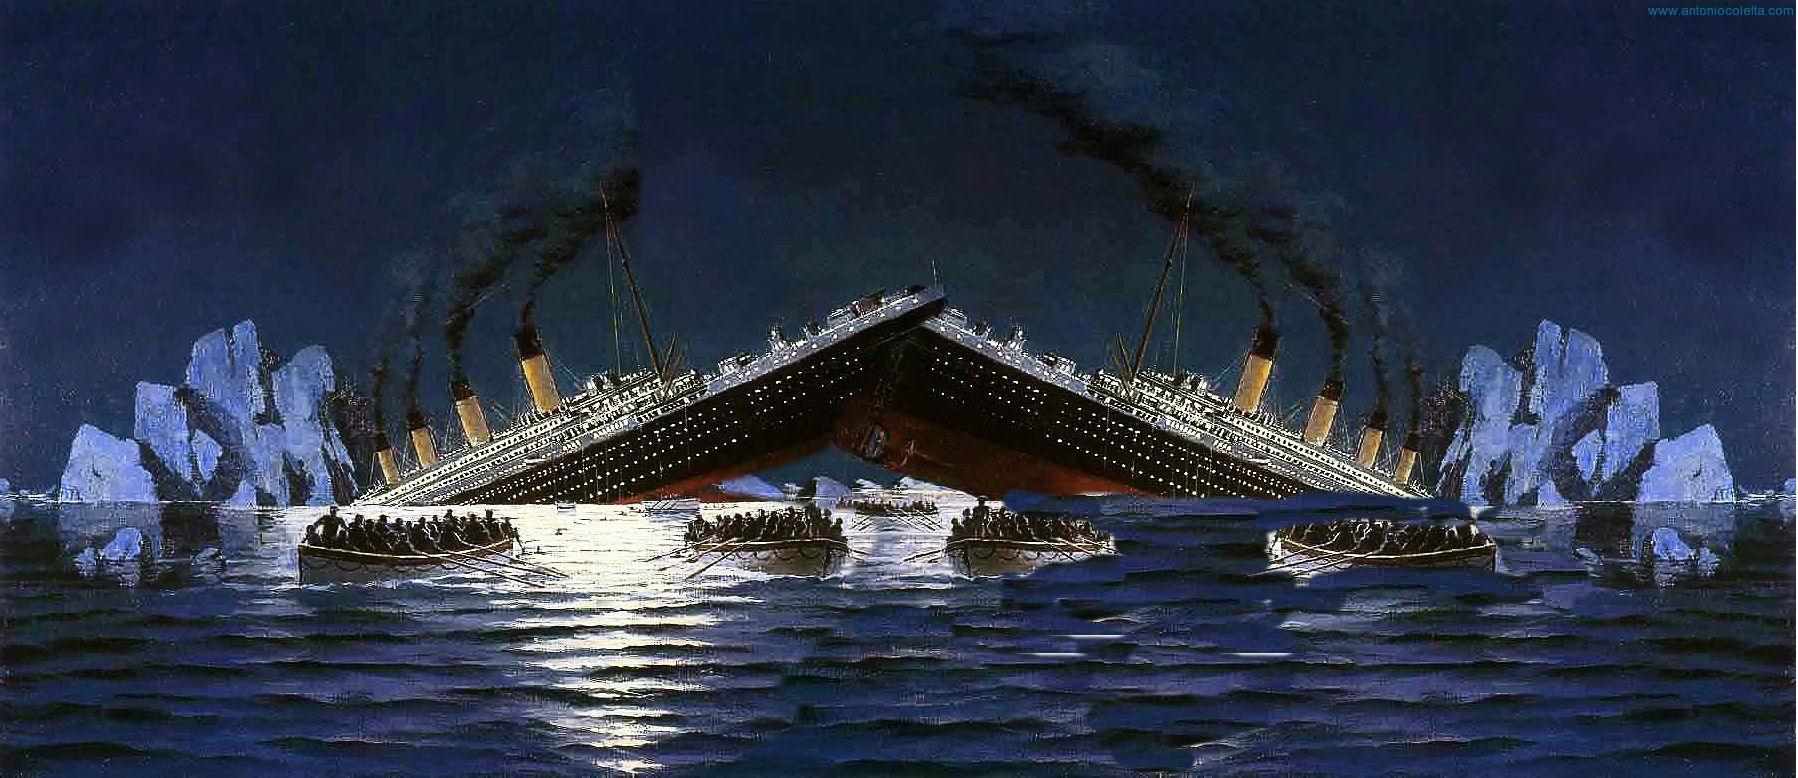 Scontro tra Titanic